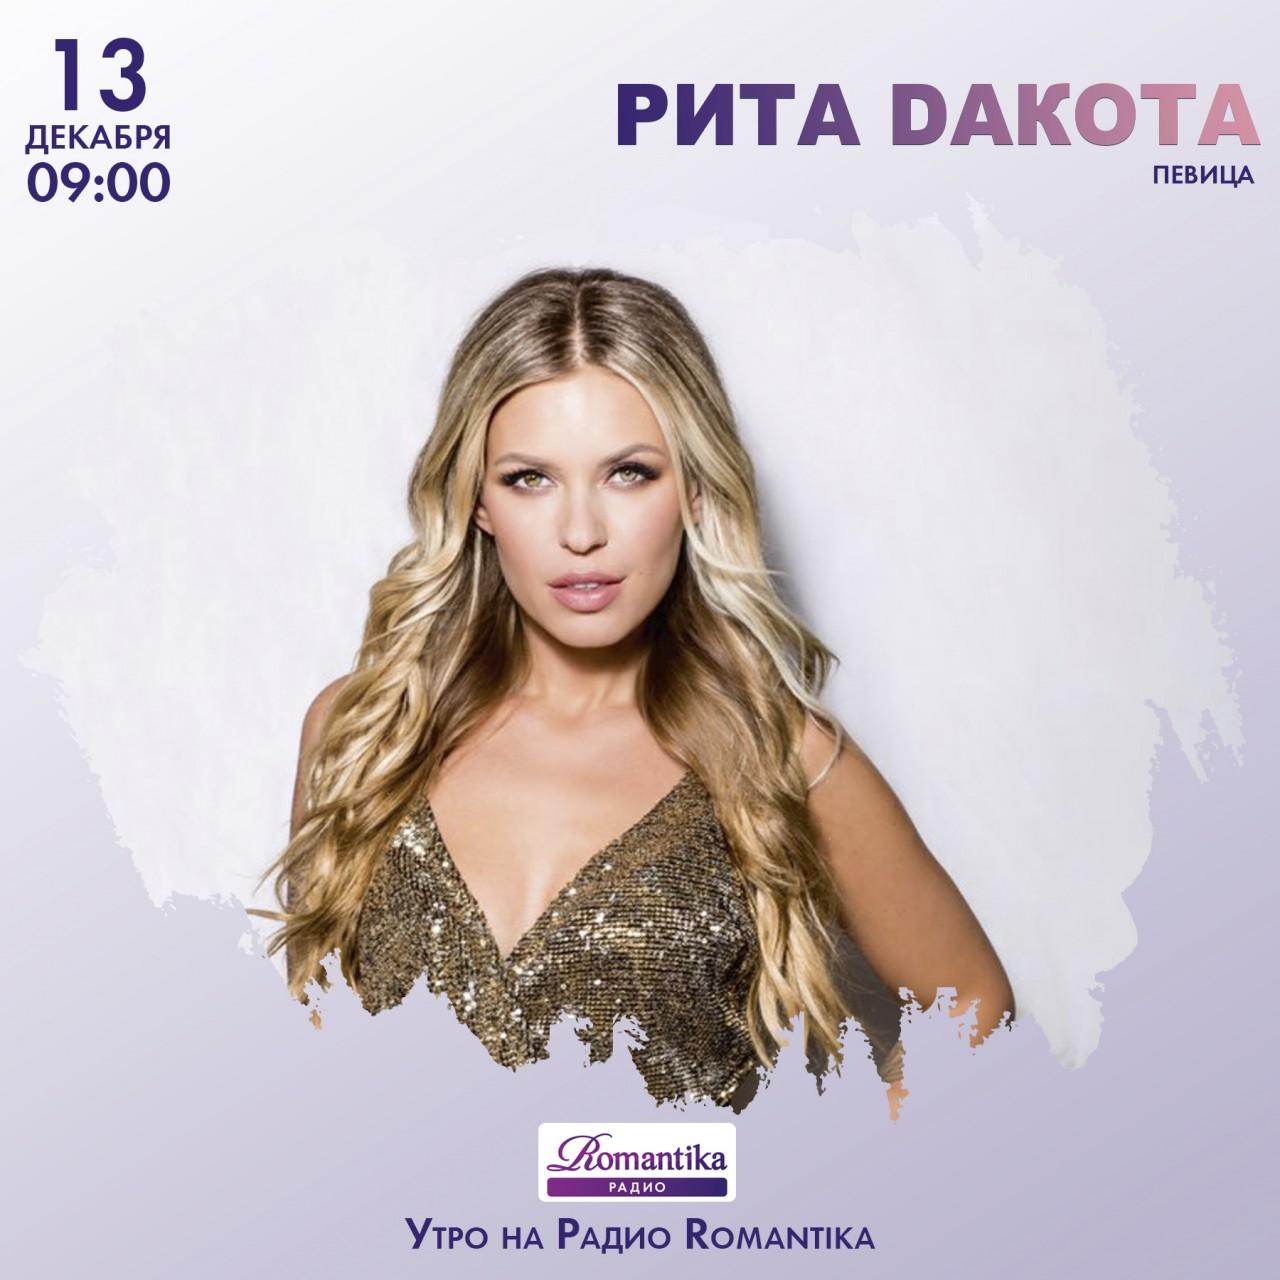 Радио Romantika: 13 декабря …